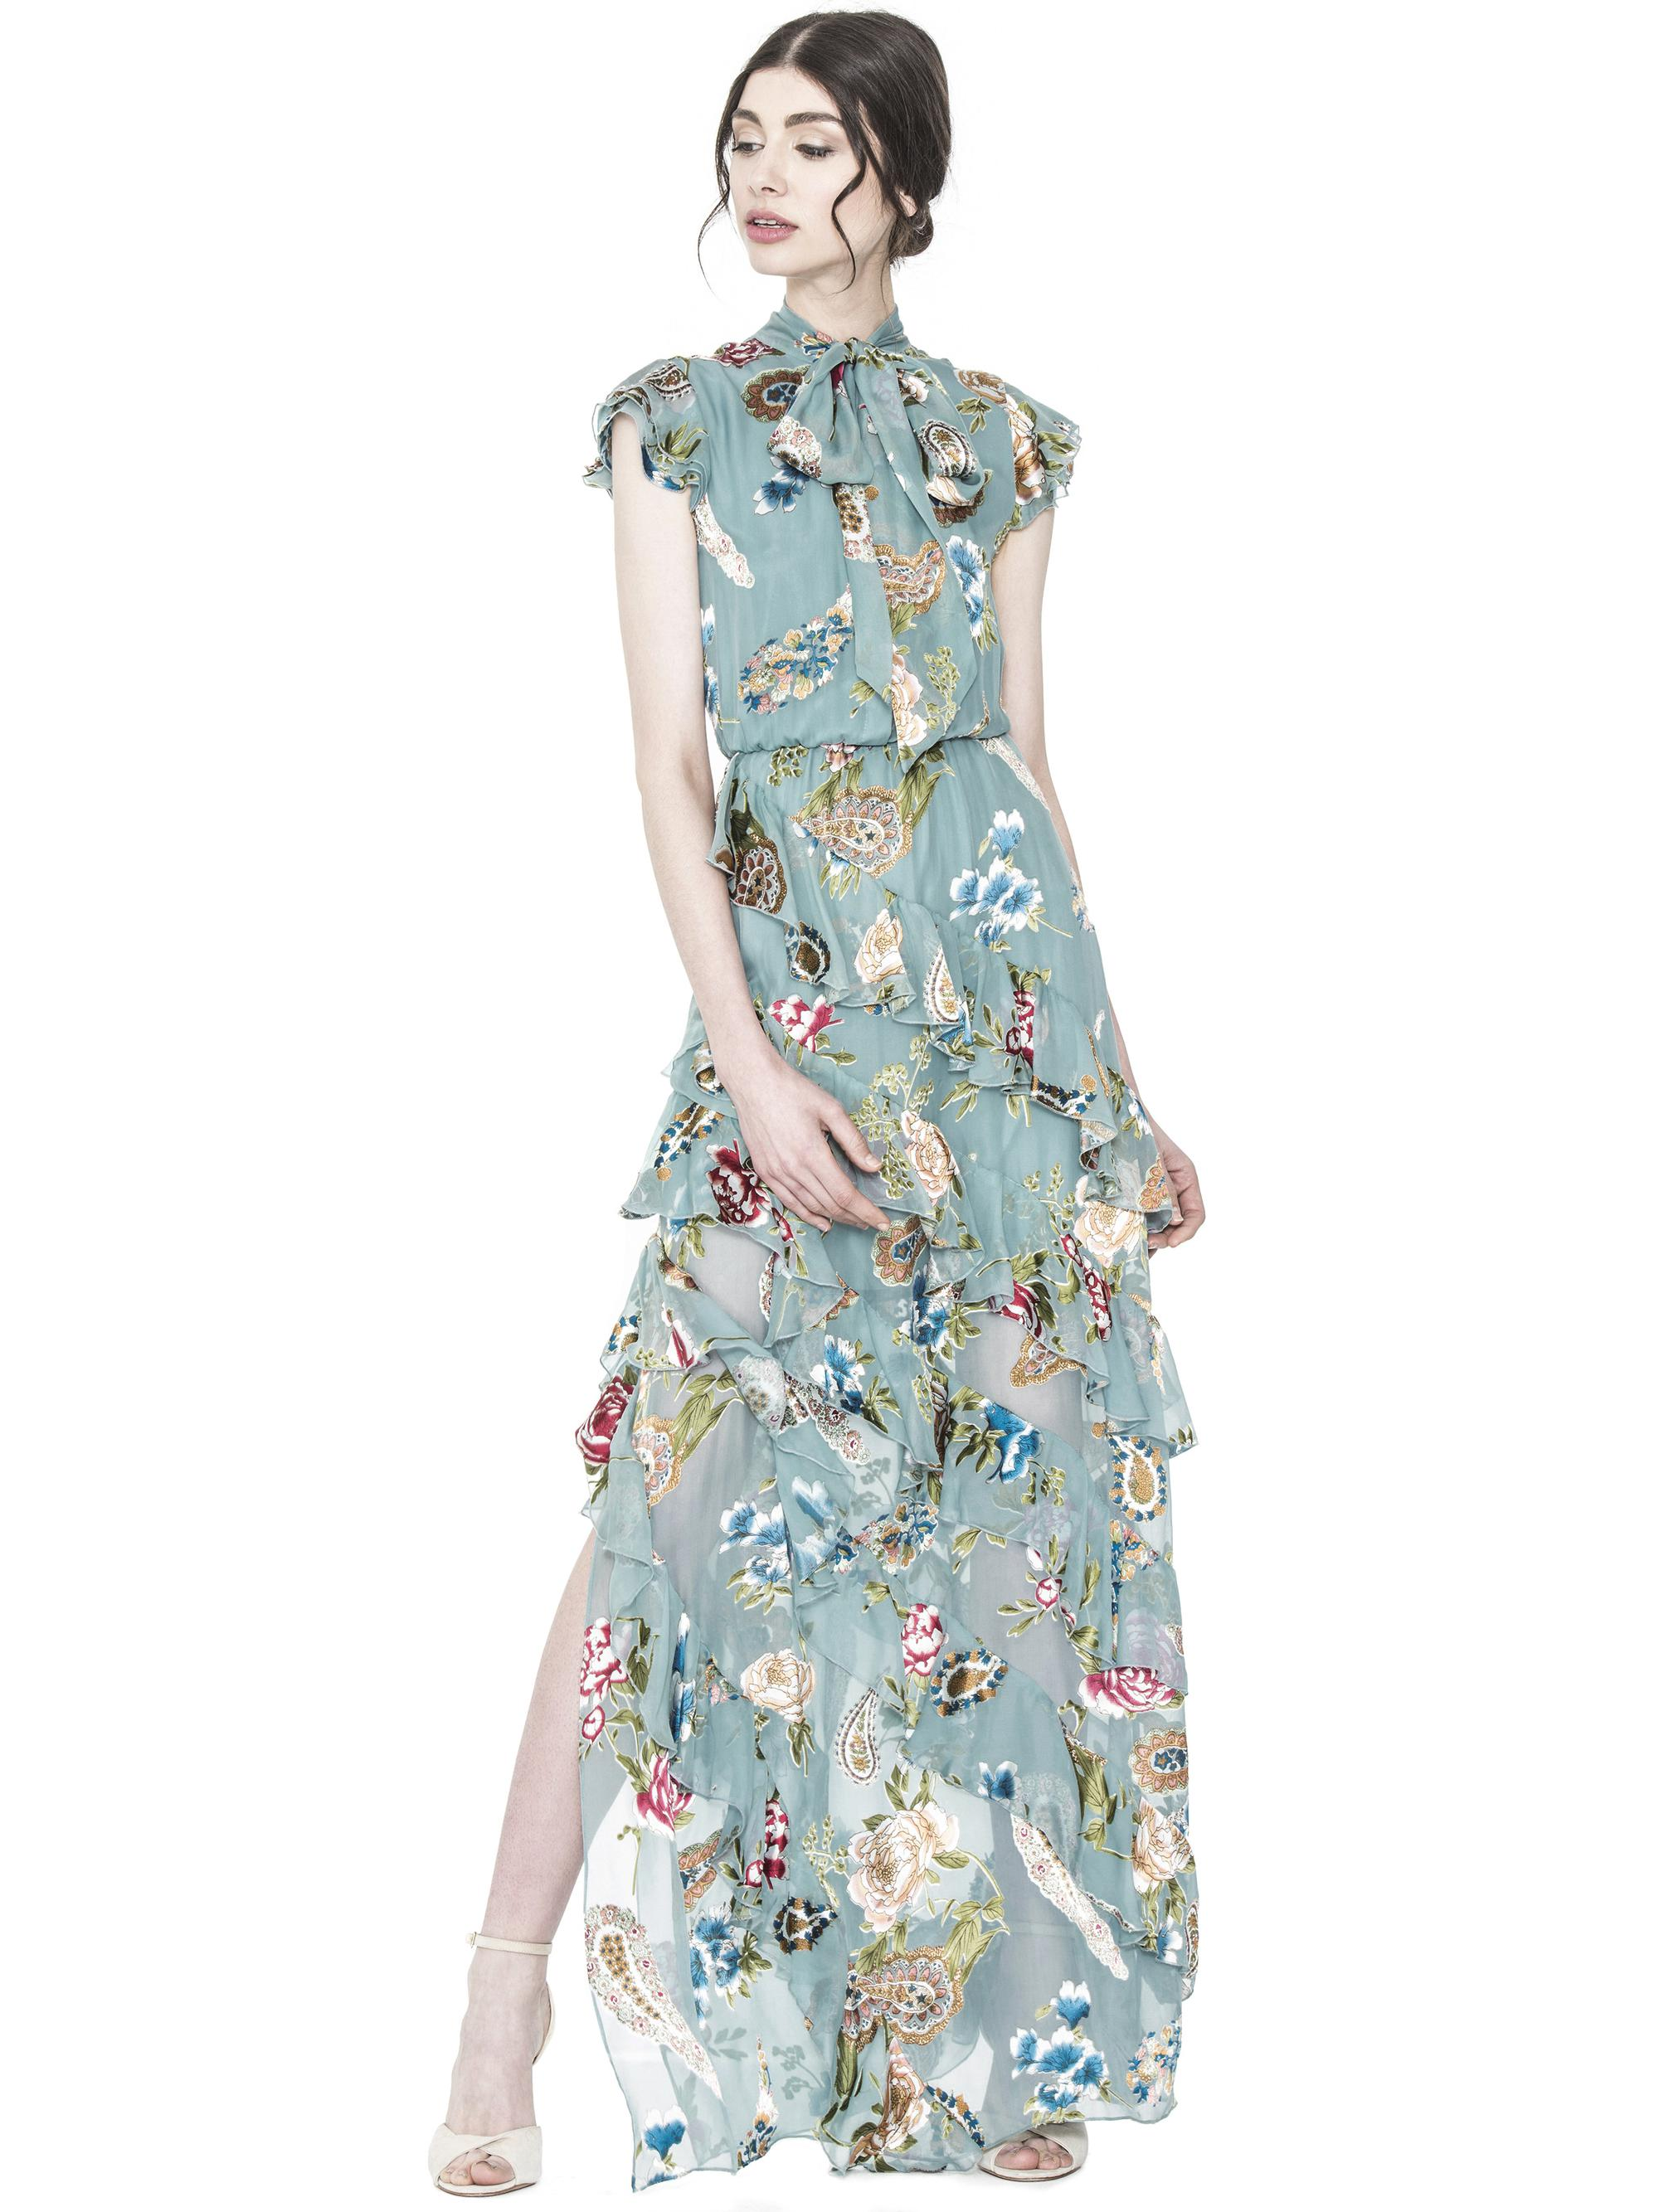 72fd61ed0ed Lyst - Alice + Olivia Lessie Tie Neck Ss Ruffle Dress in Blue